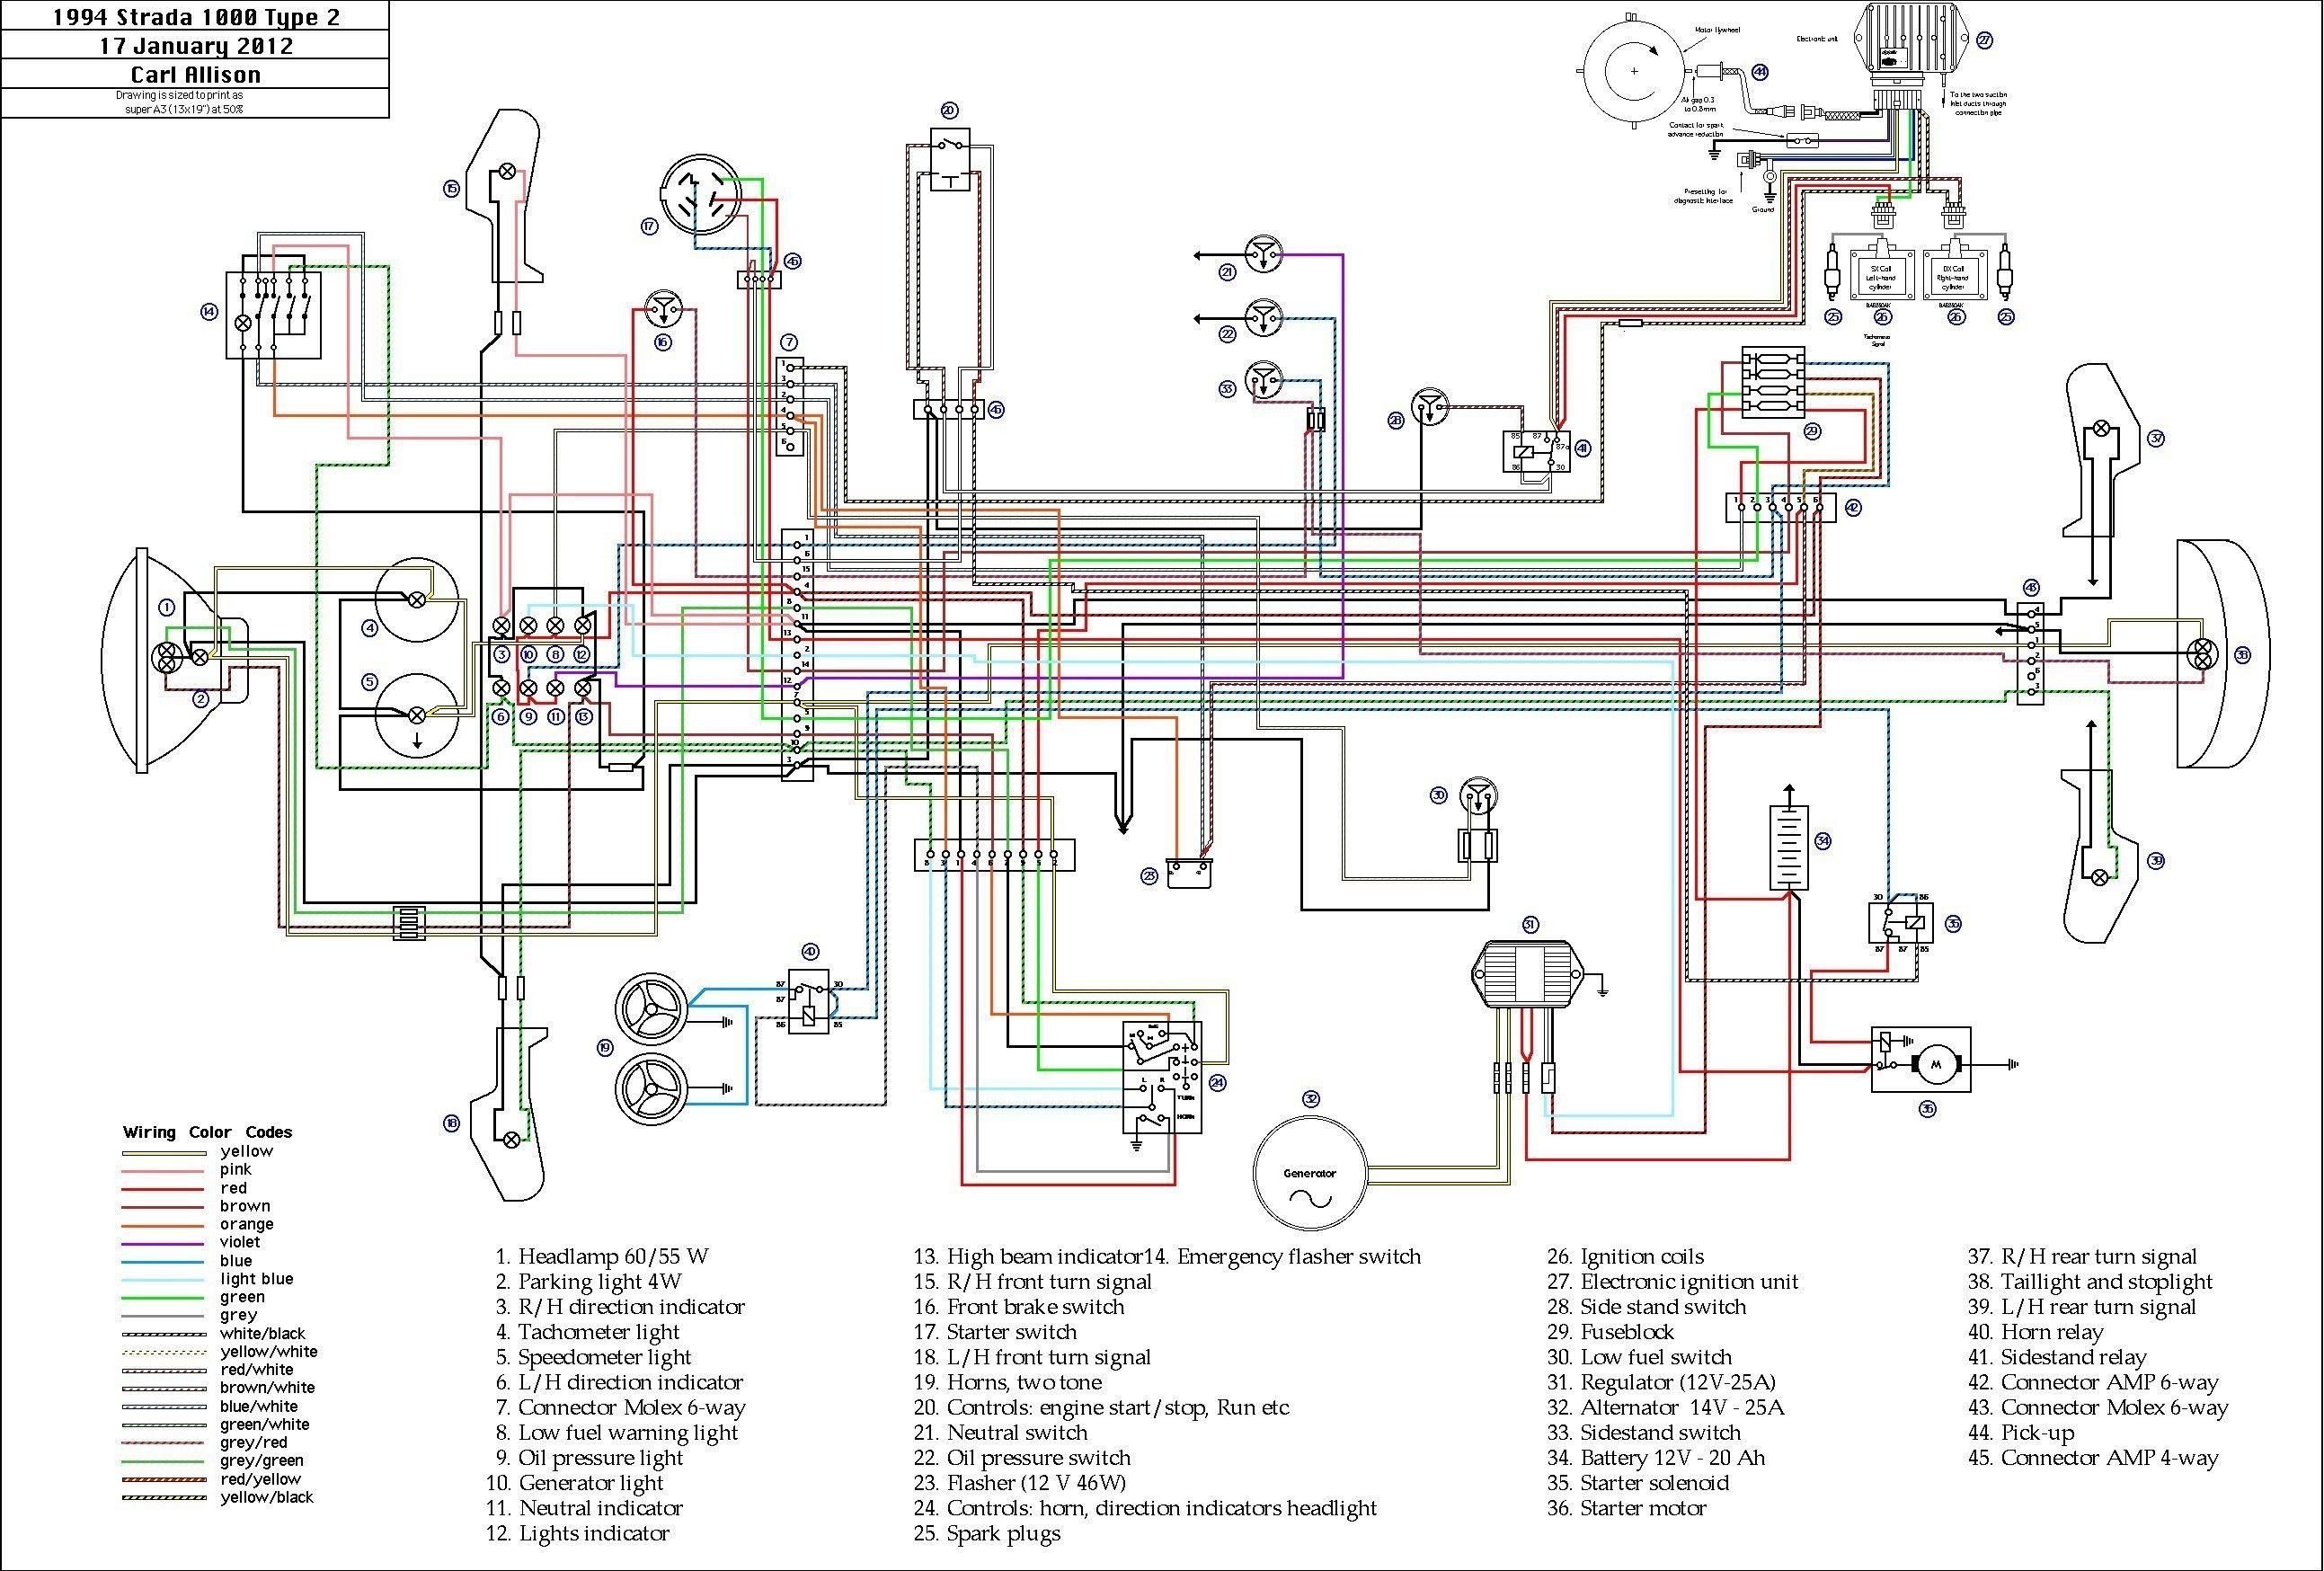 Unique Vn Alternator Wiring Diagram Diagrams Digramssample Diagramimages Wiringdiagramsample Wiringdiagram Check Mo Opel Corsa Trailer Wiring Diagram Opel